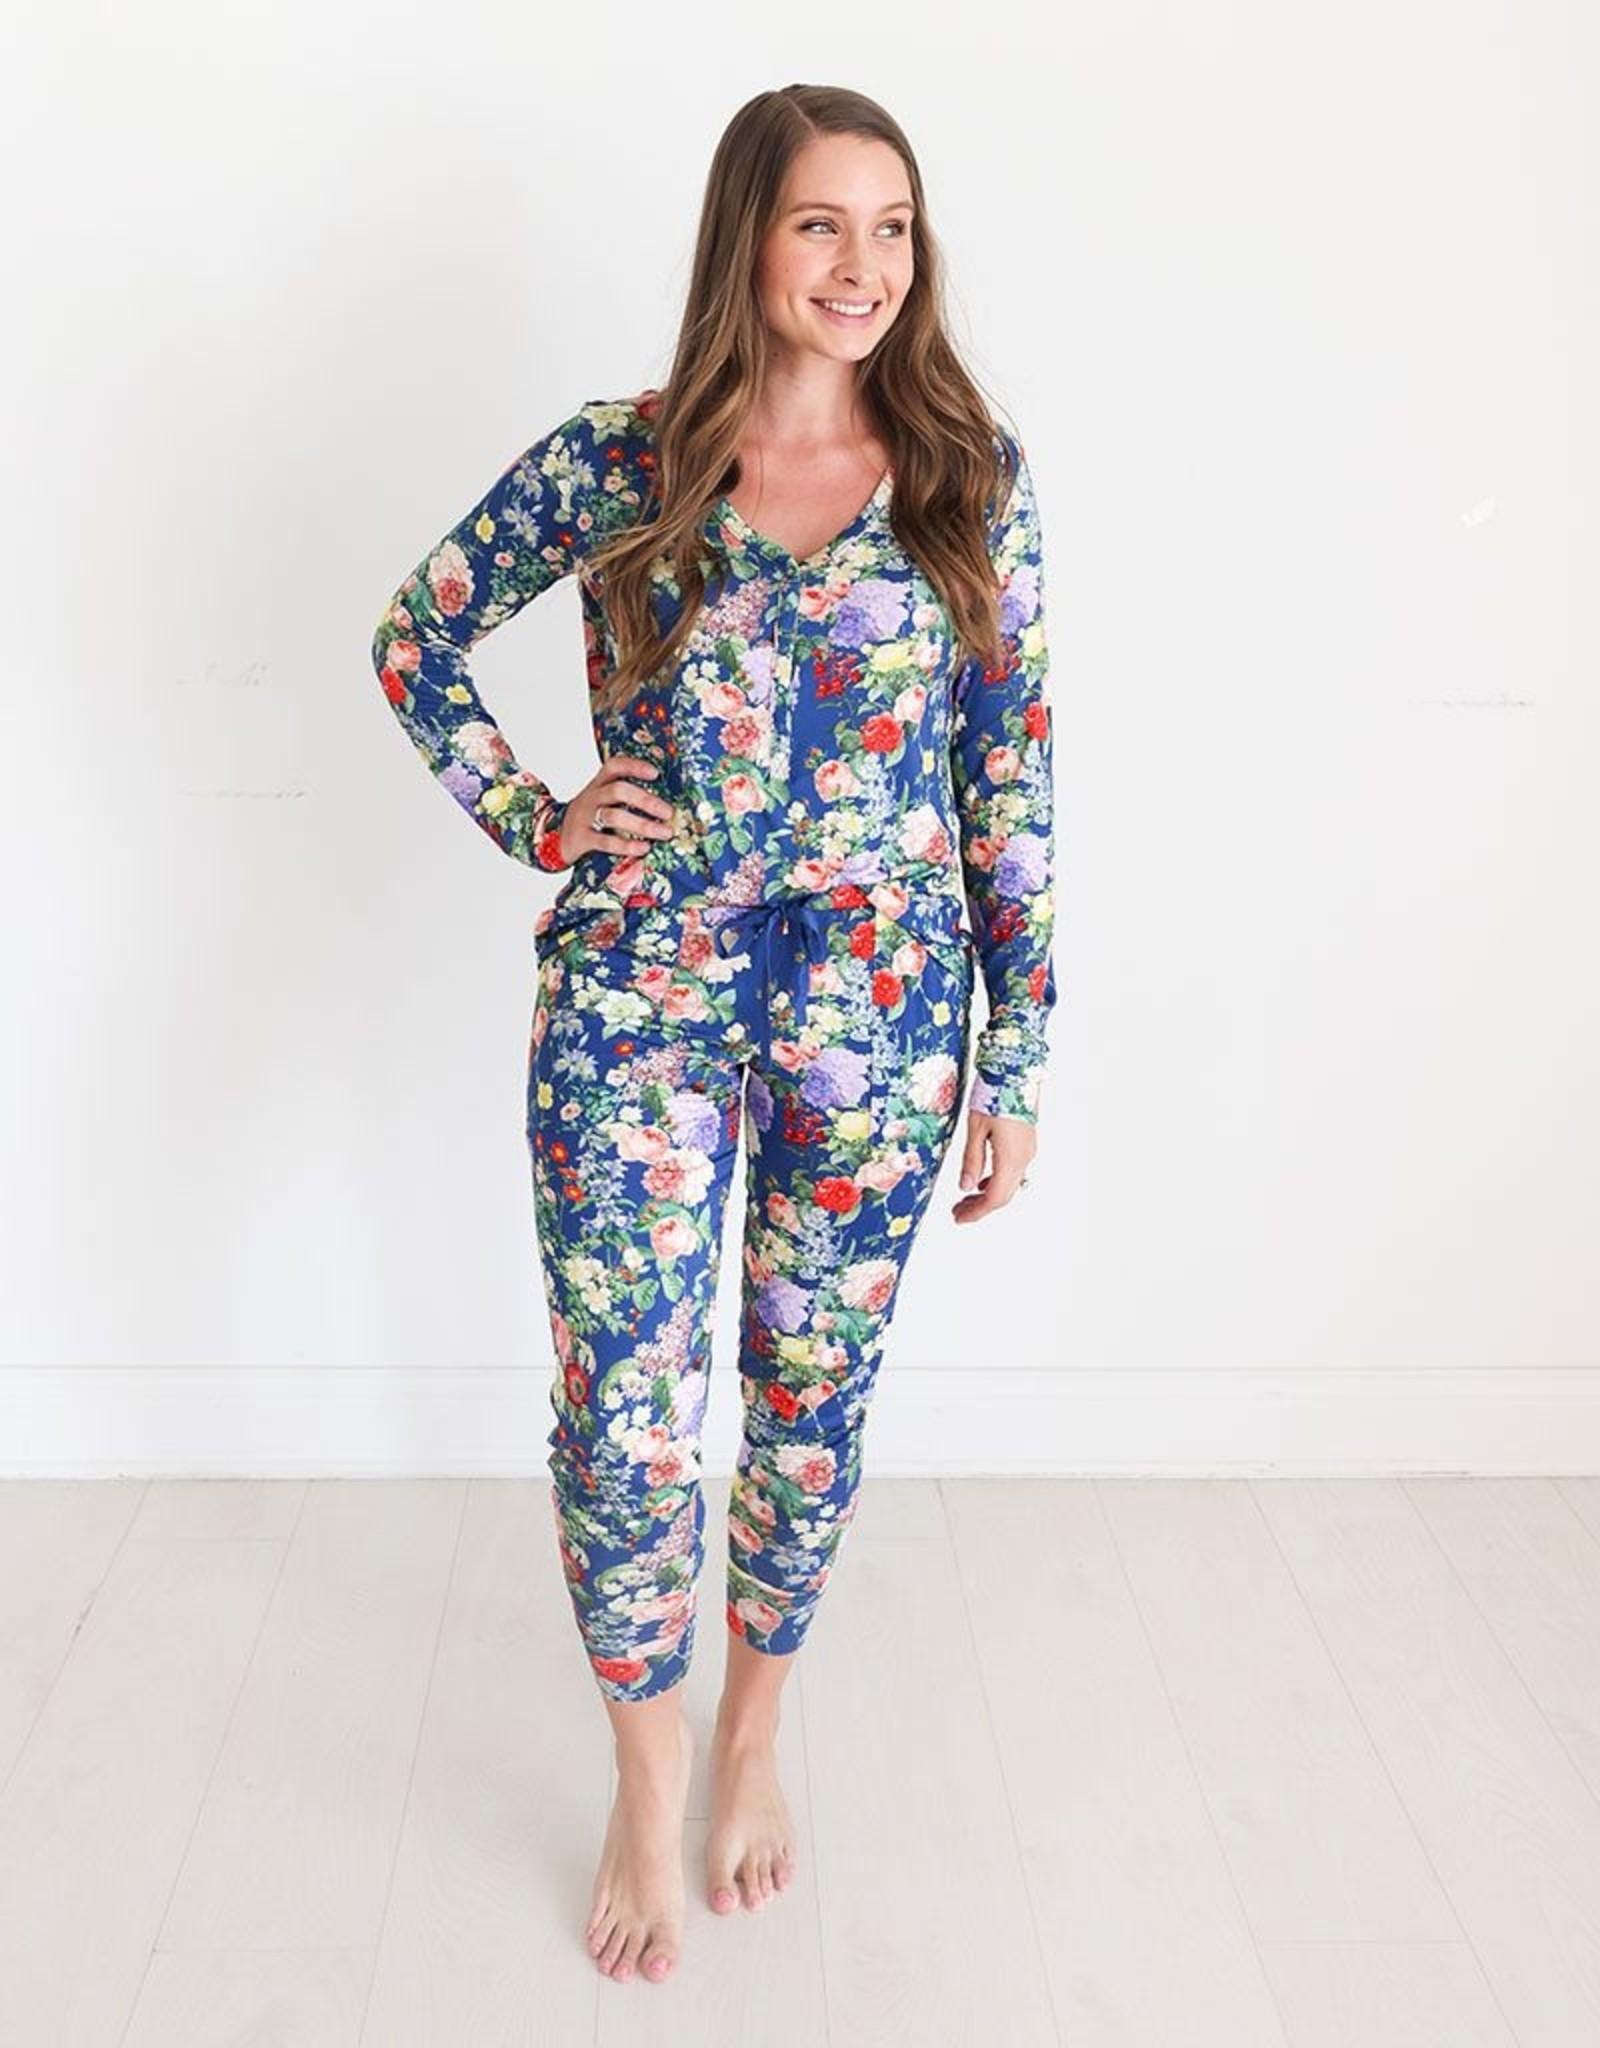 Posh Peanut Carmen - Women Pajama Set Lng Slv